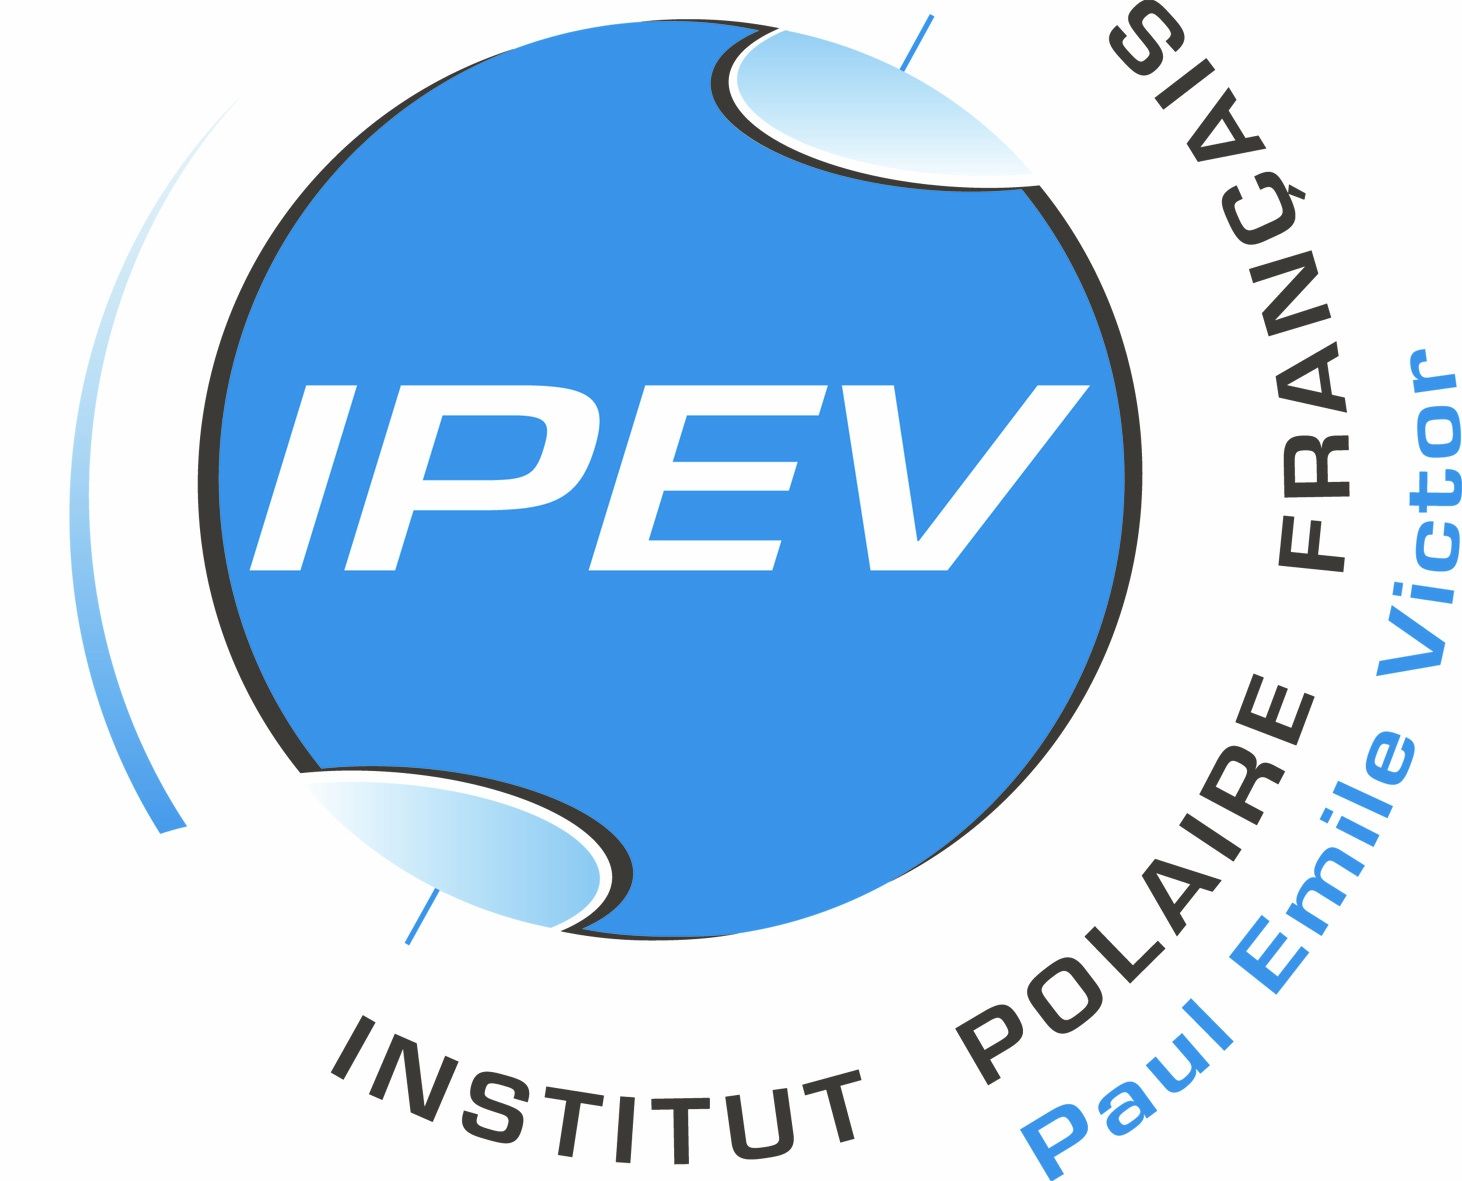 IPEV.jpg